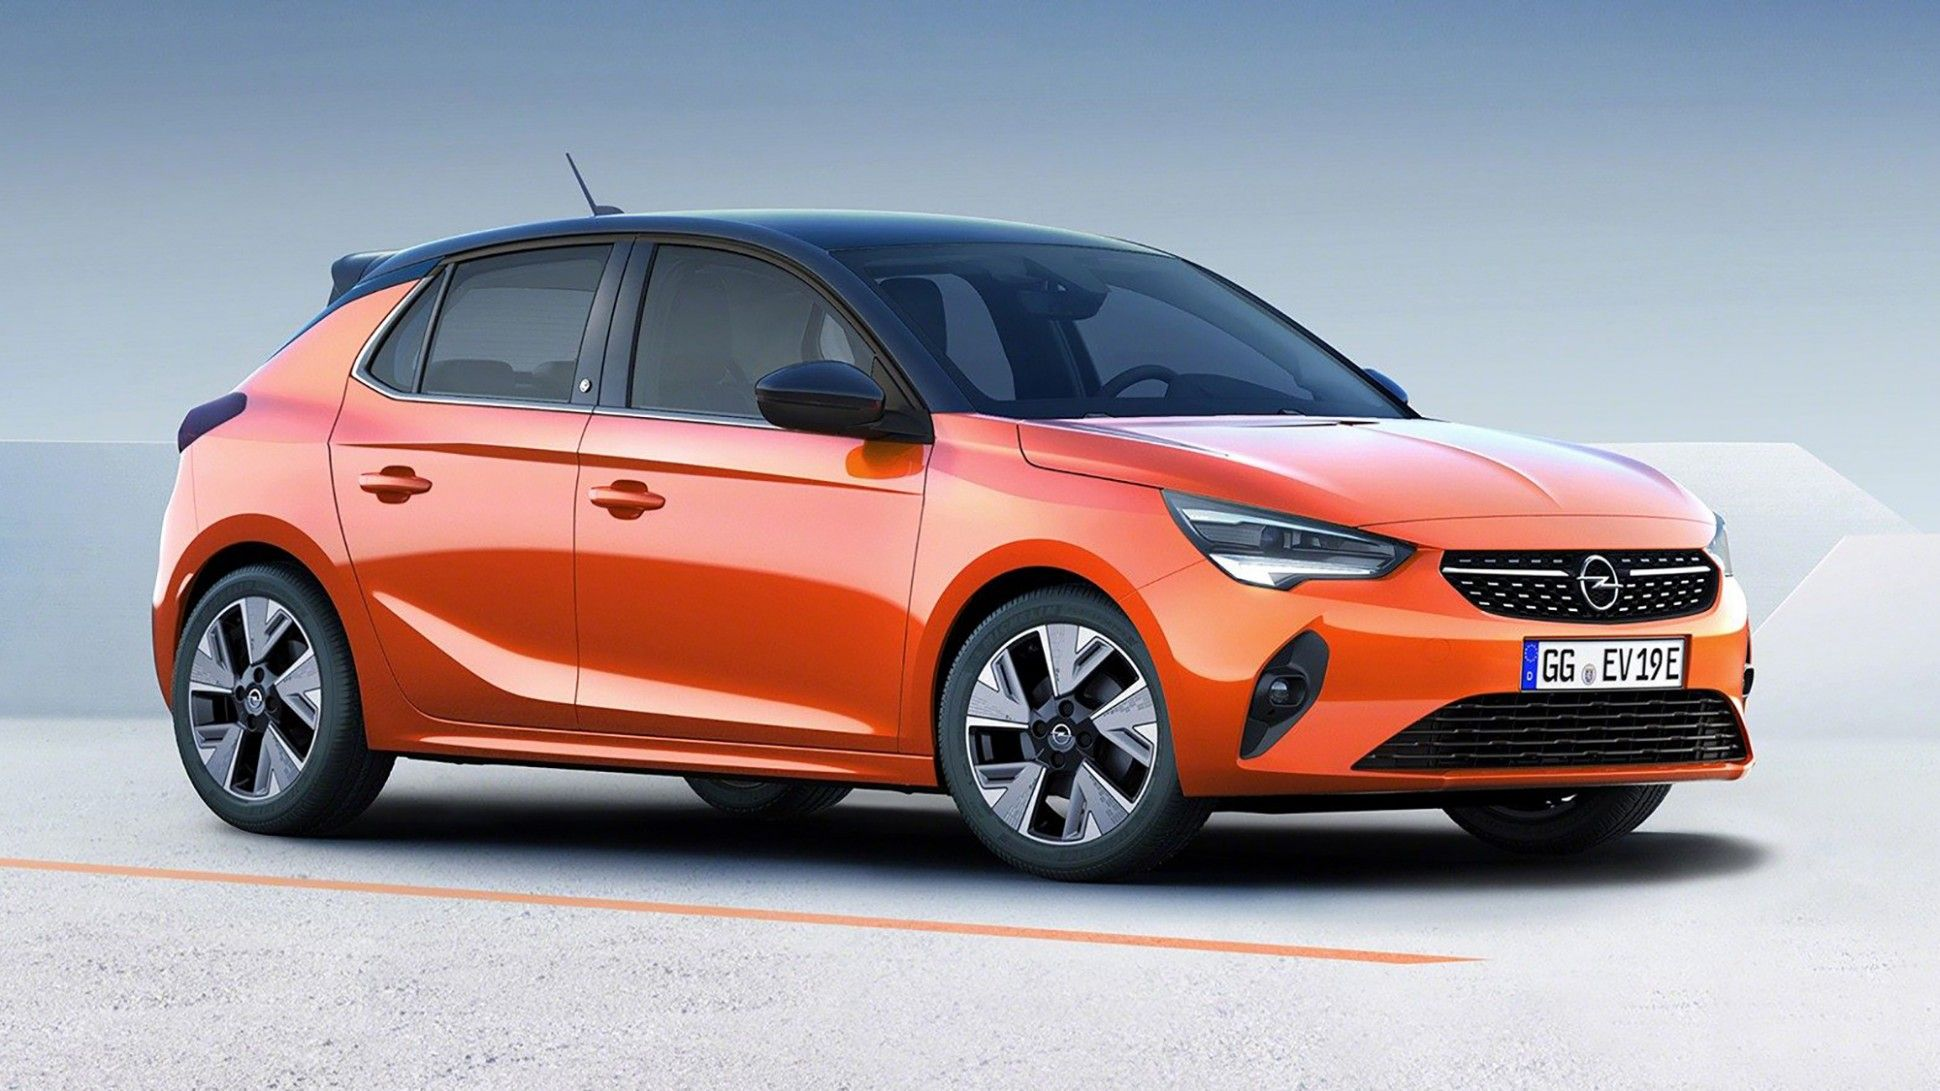 2020 Opel Fiyat Listesi Overview Opel Corsa Opel Vauxhall Corsa